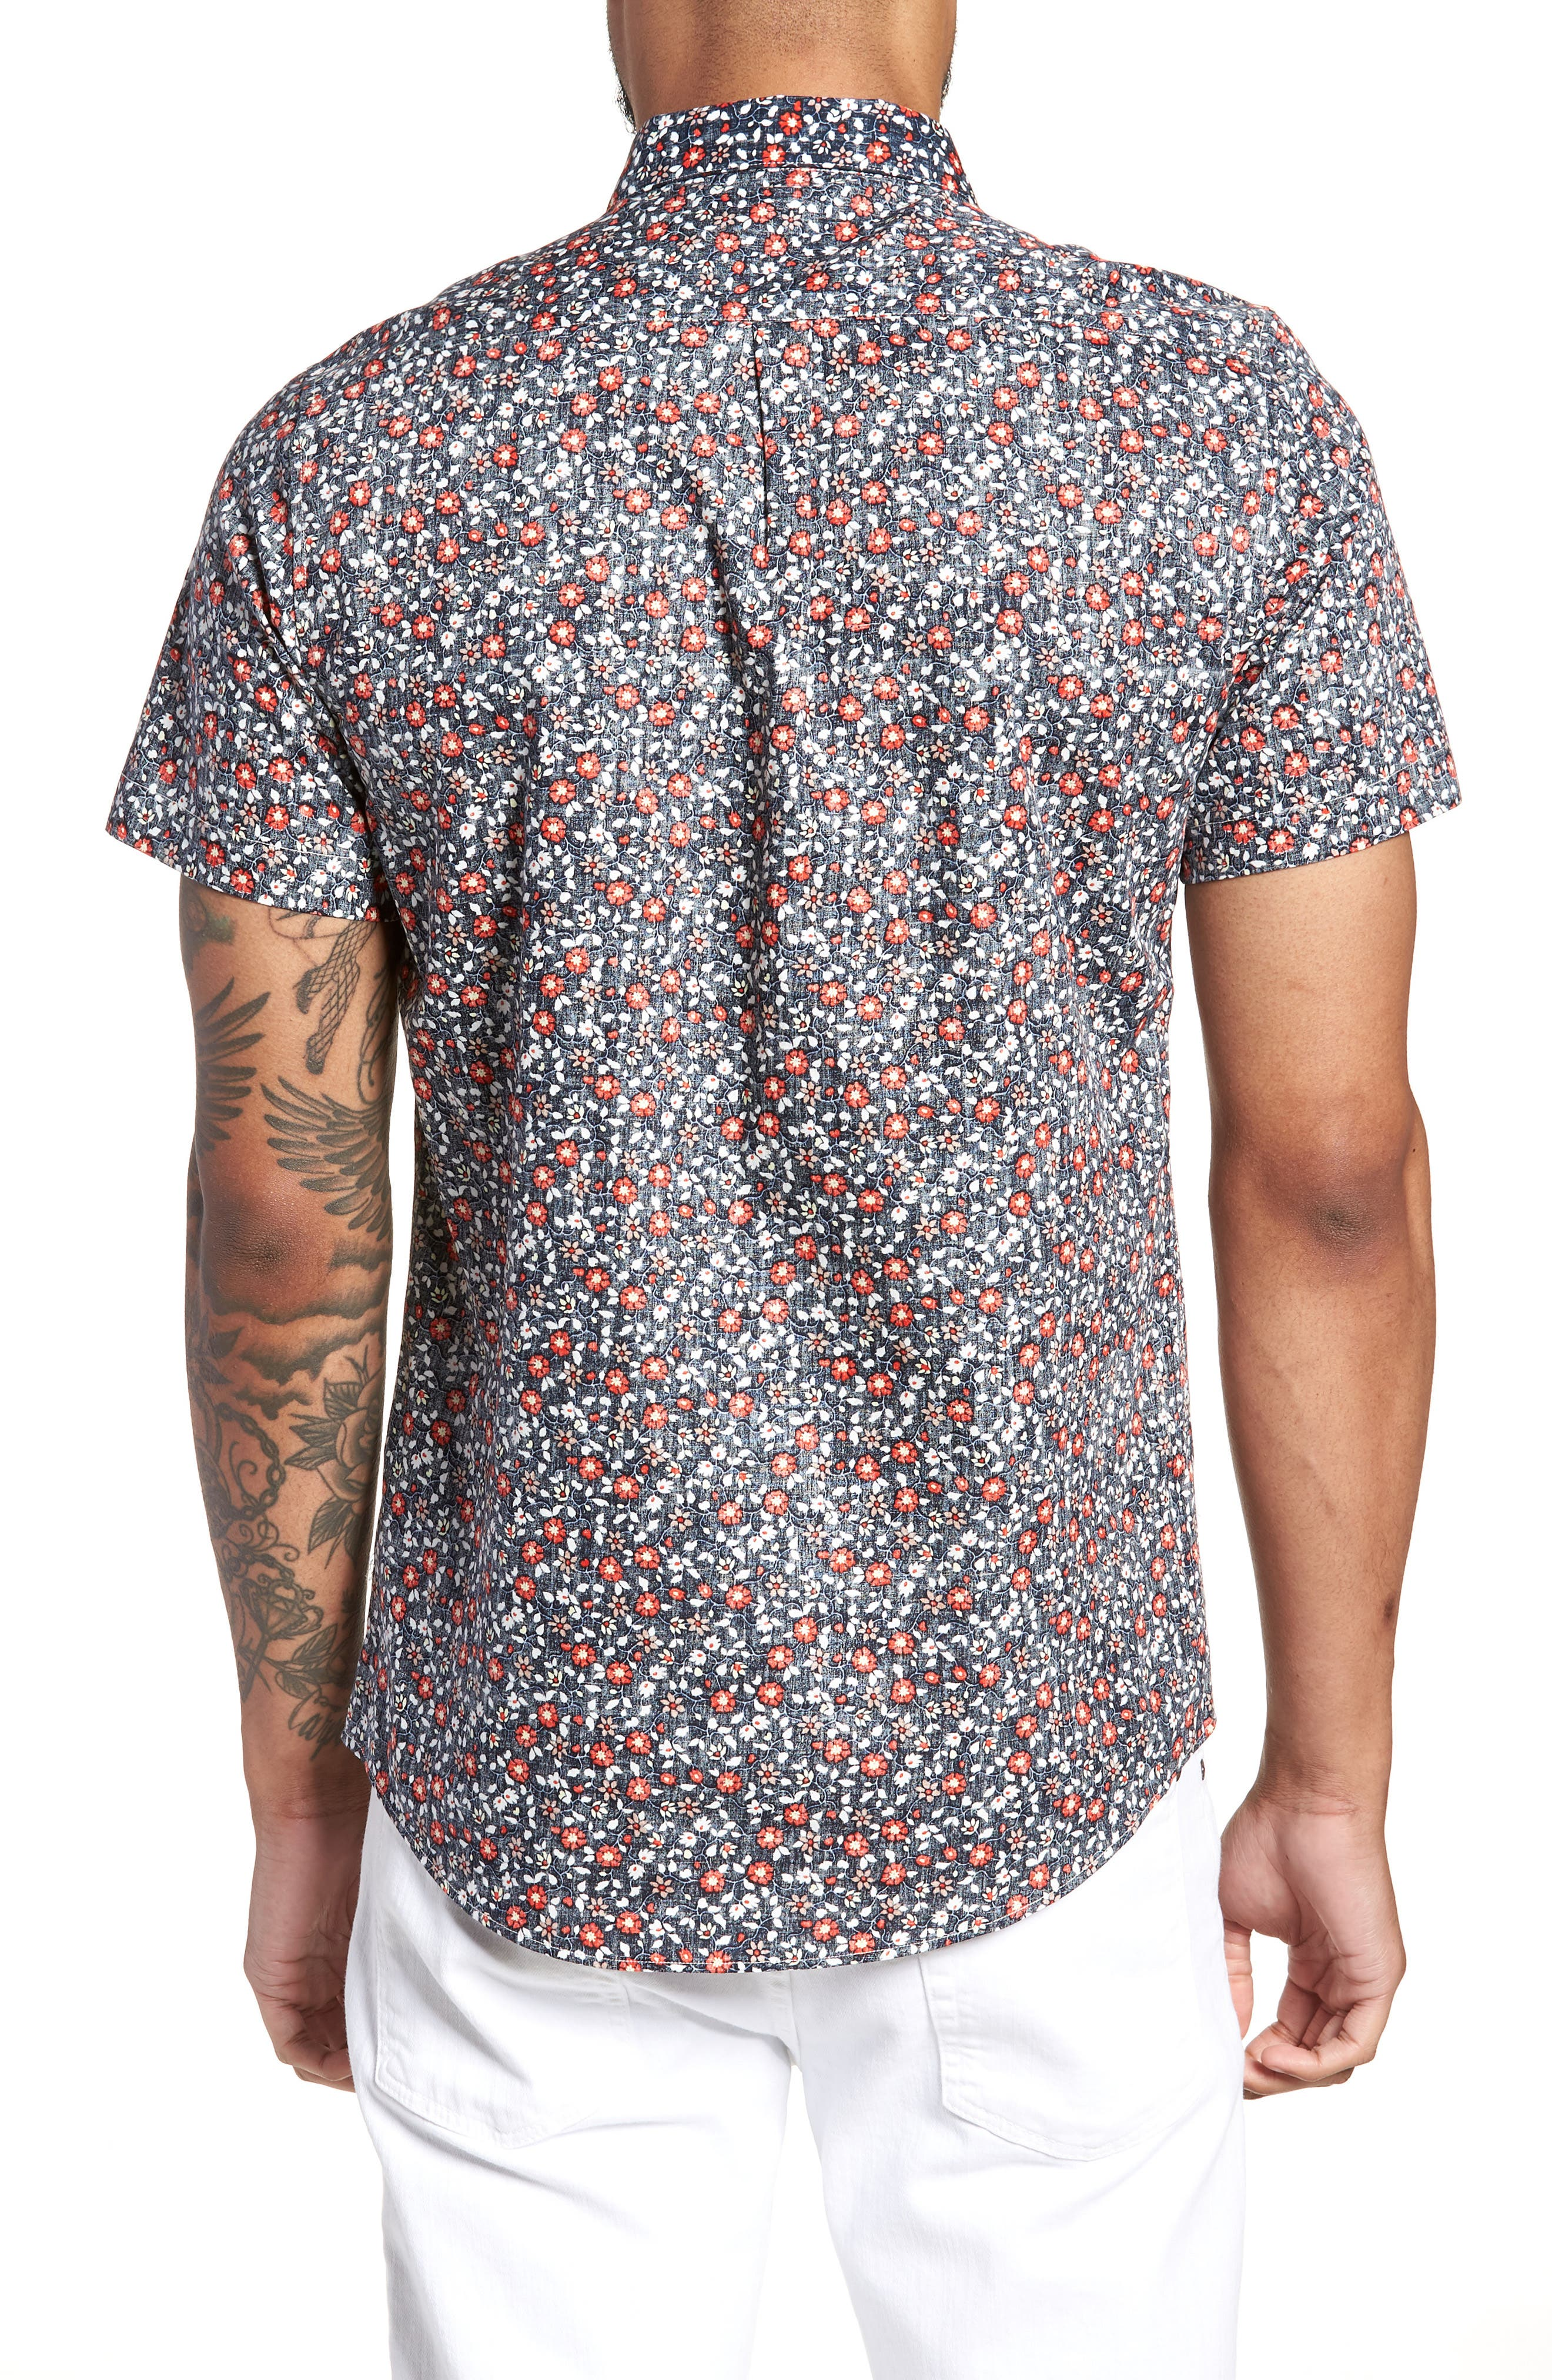 Trim Fit Print Woven Short Sleeve Shirt,                             Alternate thumbnail 2, color,                             Navy Floral